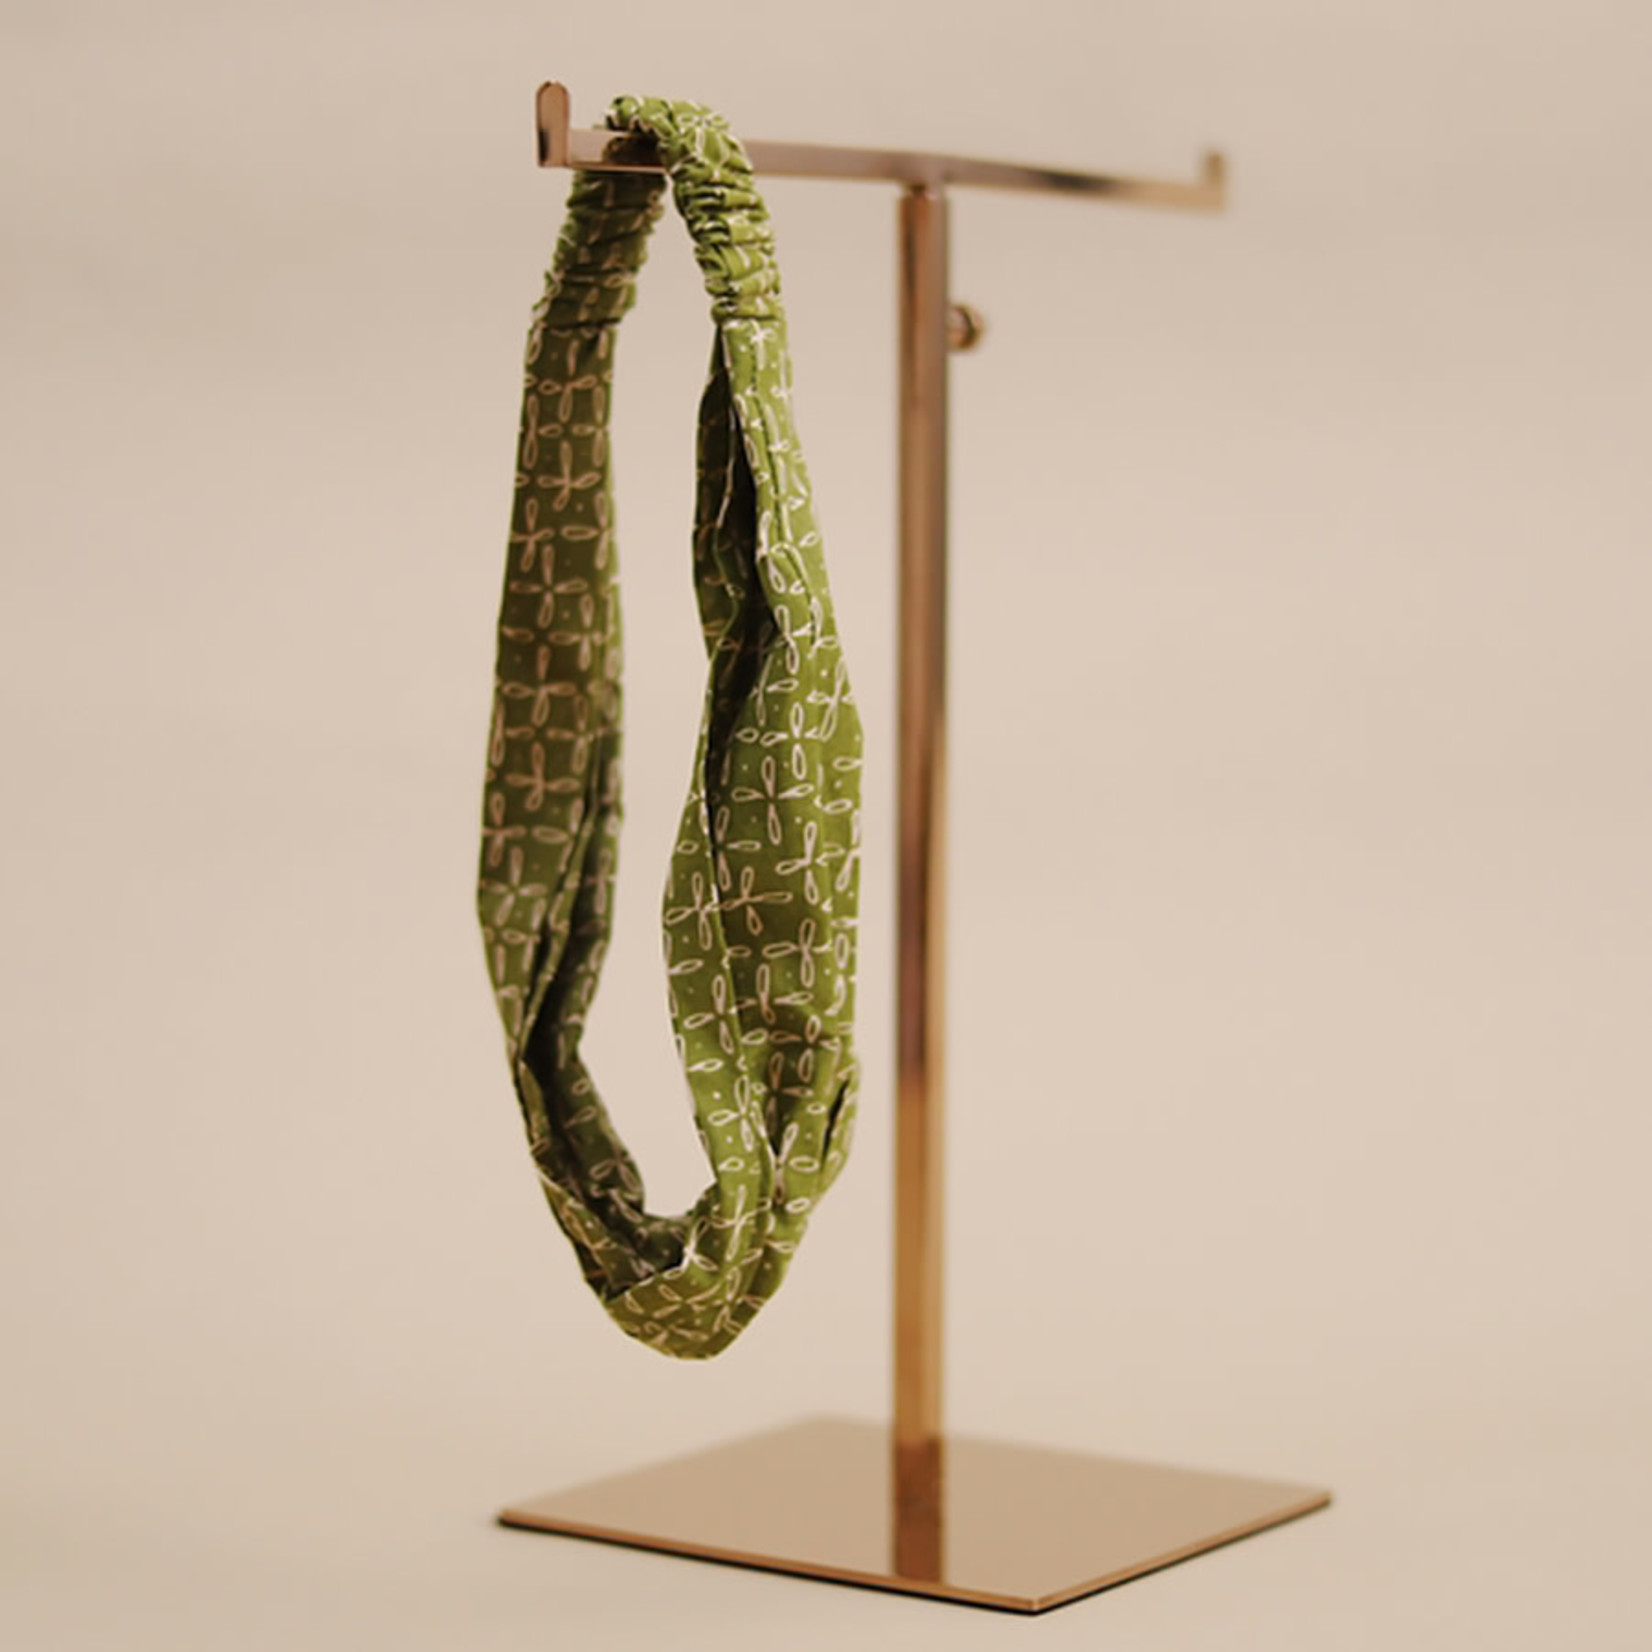 Hemlock Goods Hemlock Headband